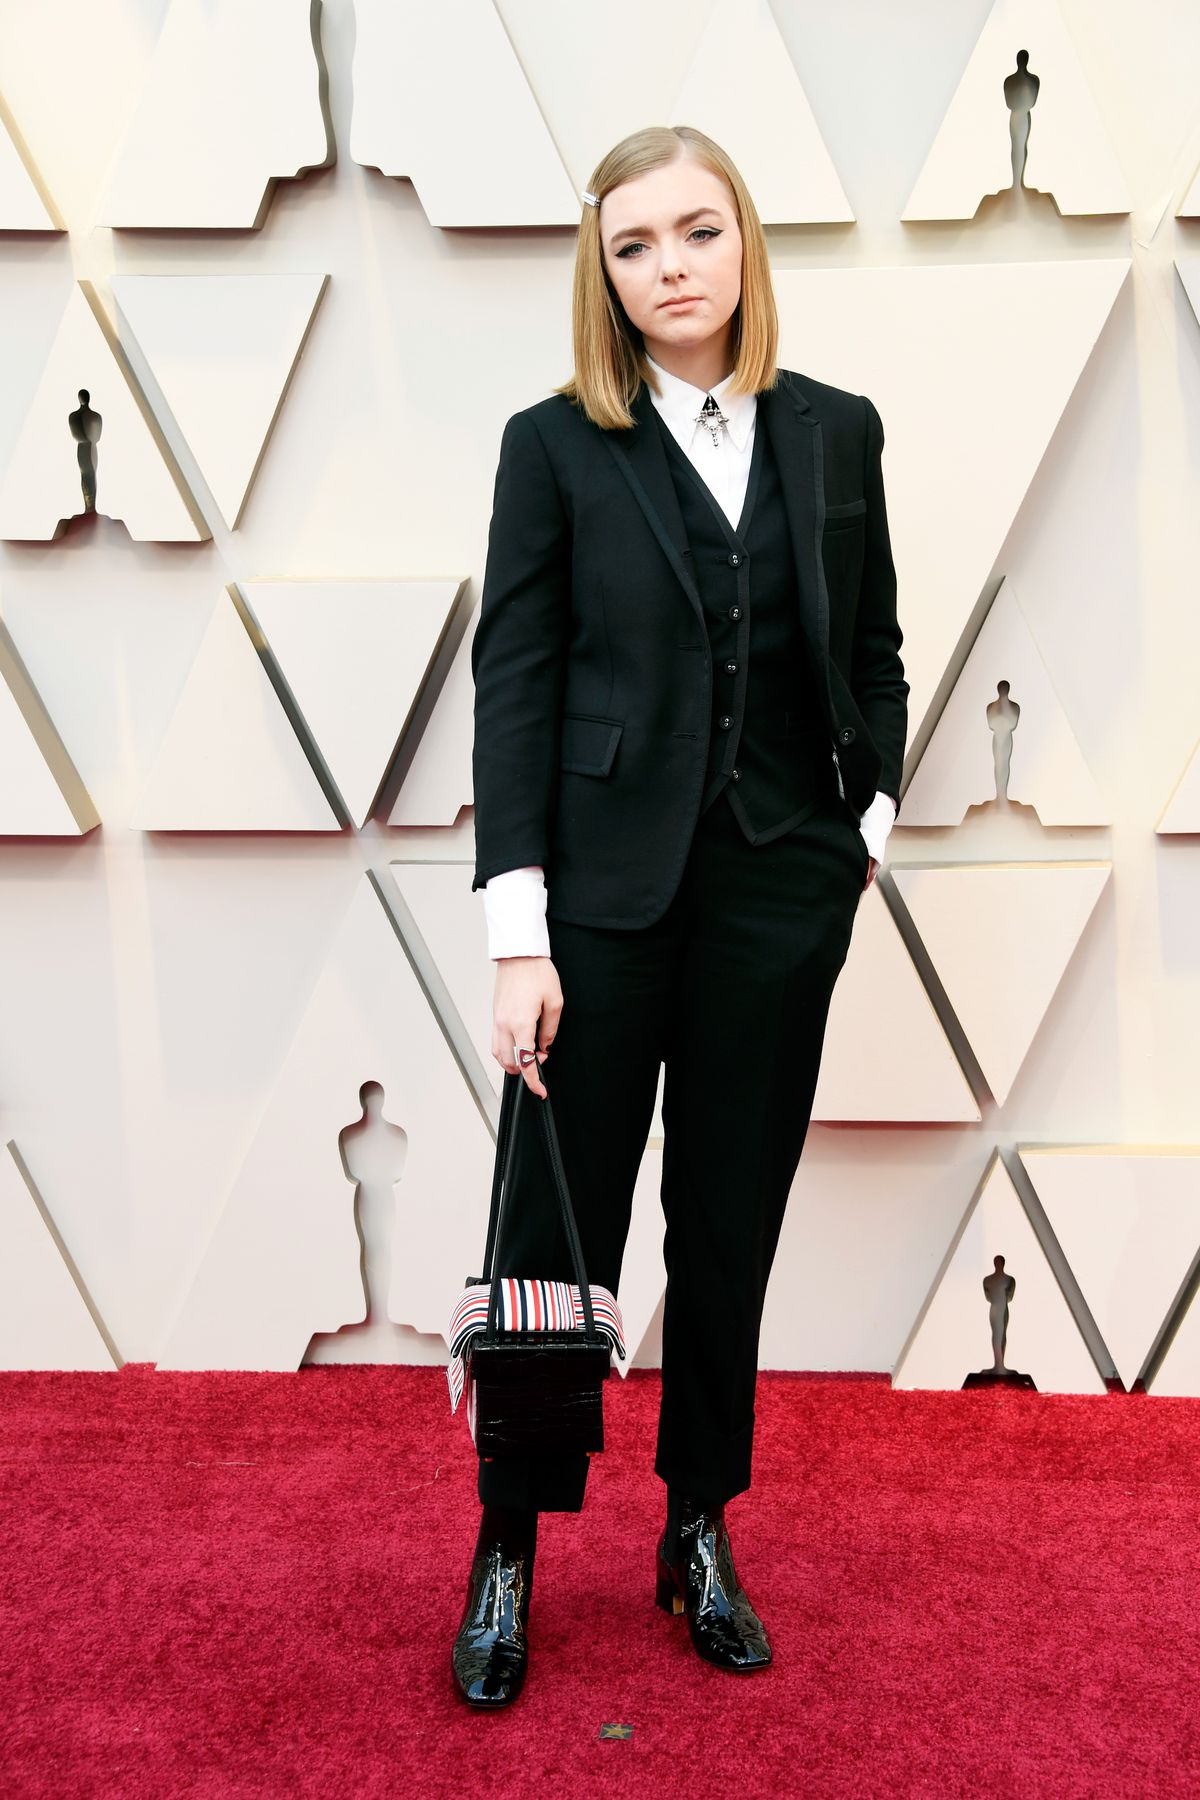 24c09ff308f Oscars 2019  best-dressed celebrity fashion on the red carpet - Vox